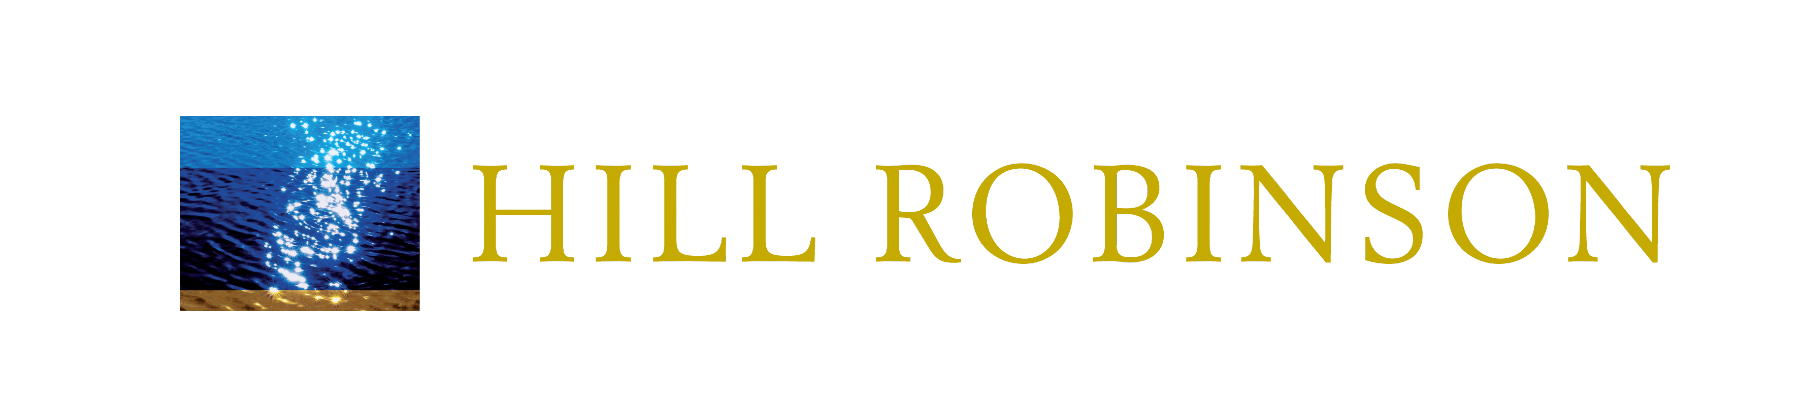 Hill Robinson Logo